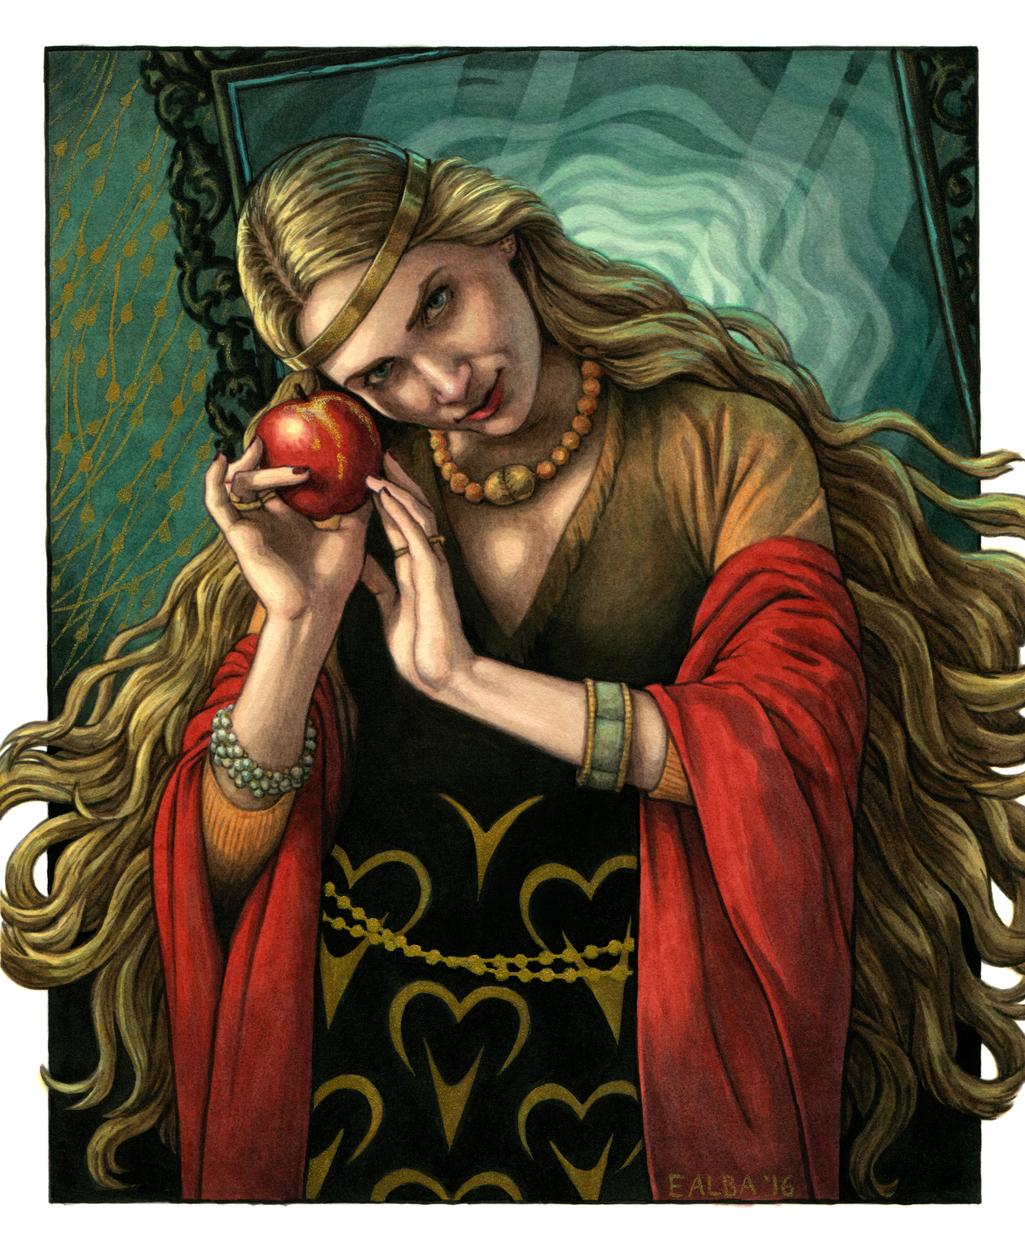 Poison Apple Artwork by Elisabeth Alba